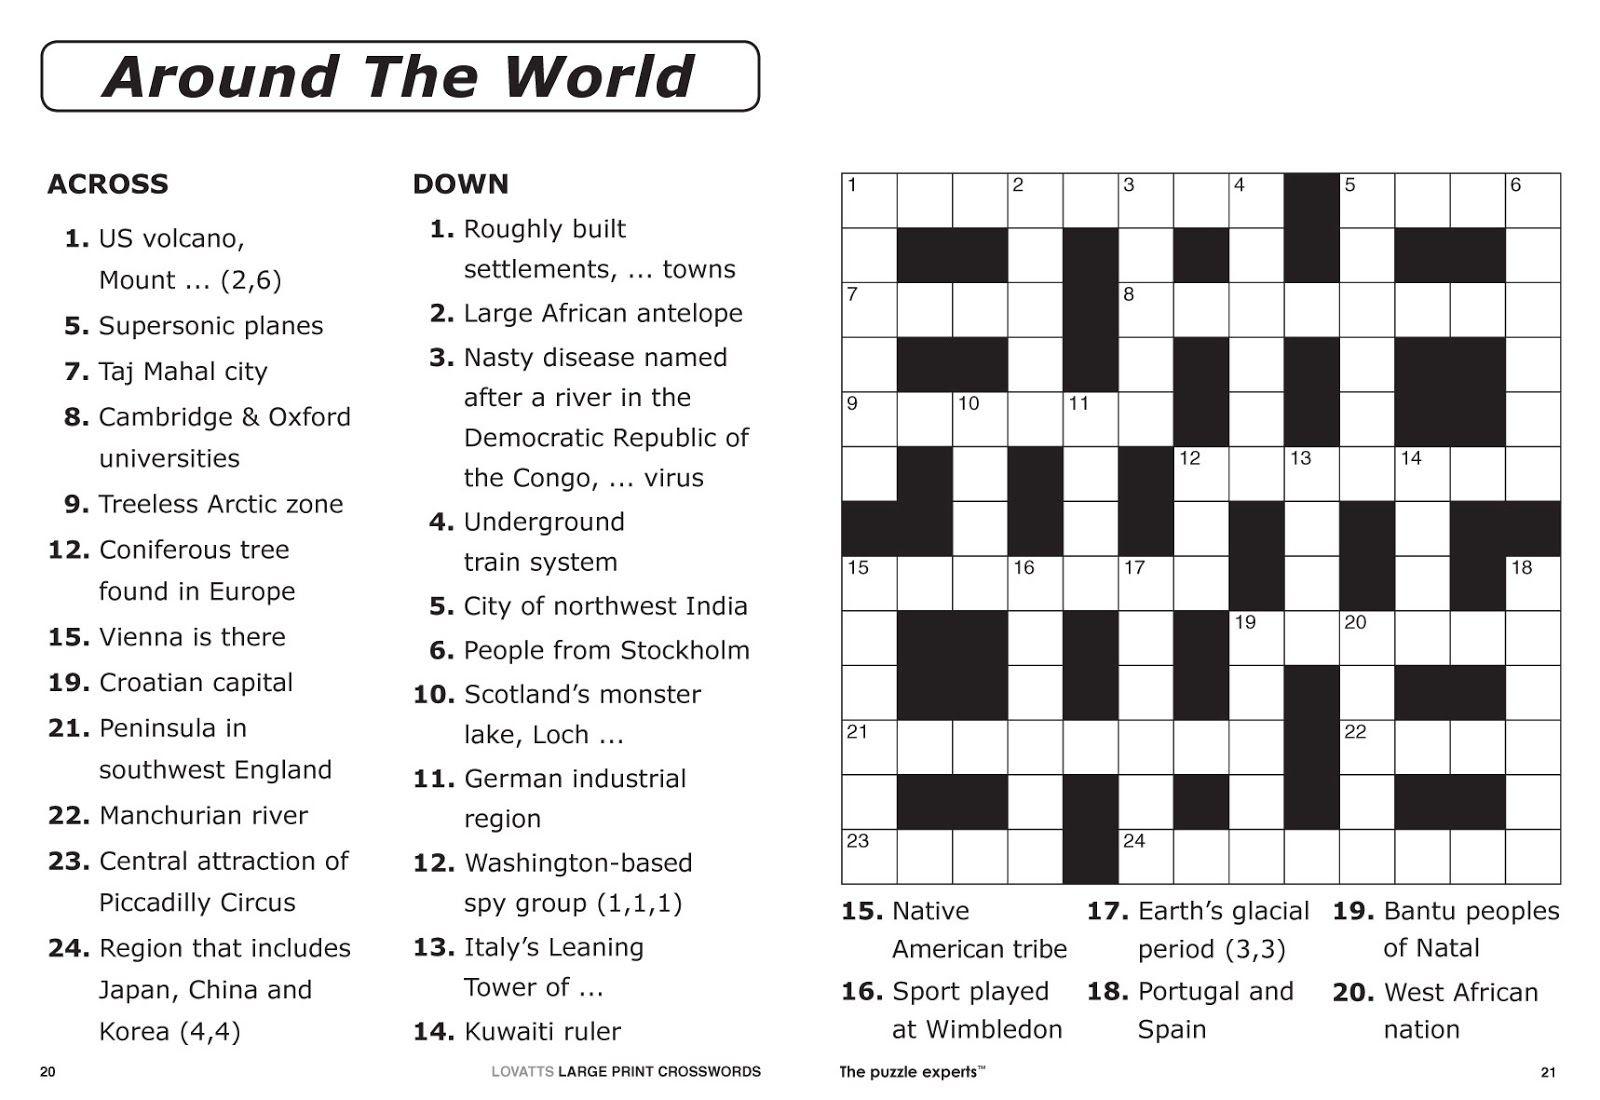 Easy Printable Crossword Puzzles | Elder Care & Dementia Care - Easy Printable Crossword Puzzles For Seniors